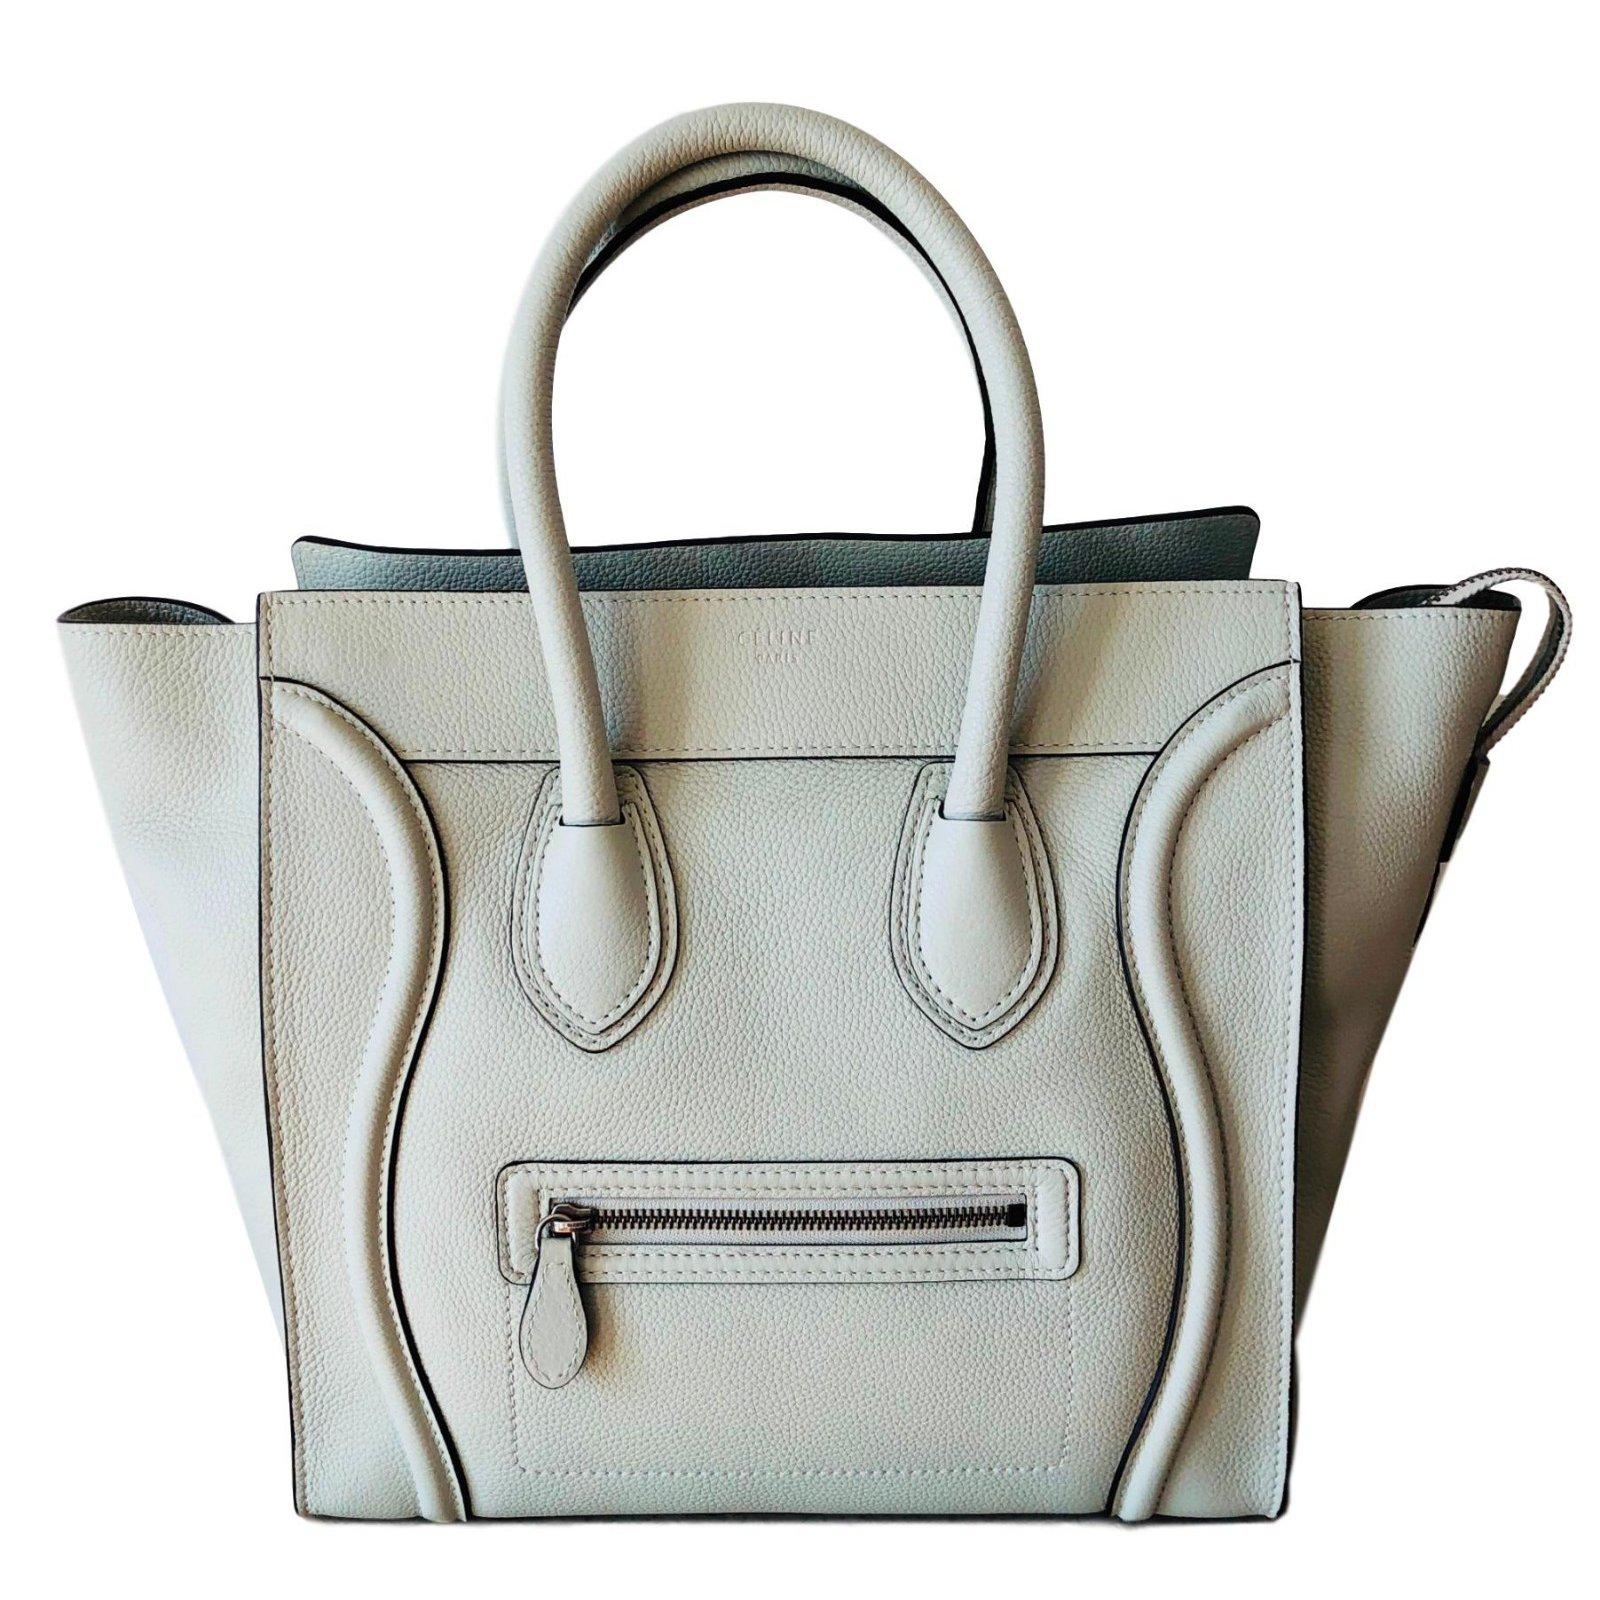 1eb7ebb25b53 Céline luggage mini handbags leather other ref joli closet jpg 1600x1600 Mini  celine